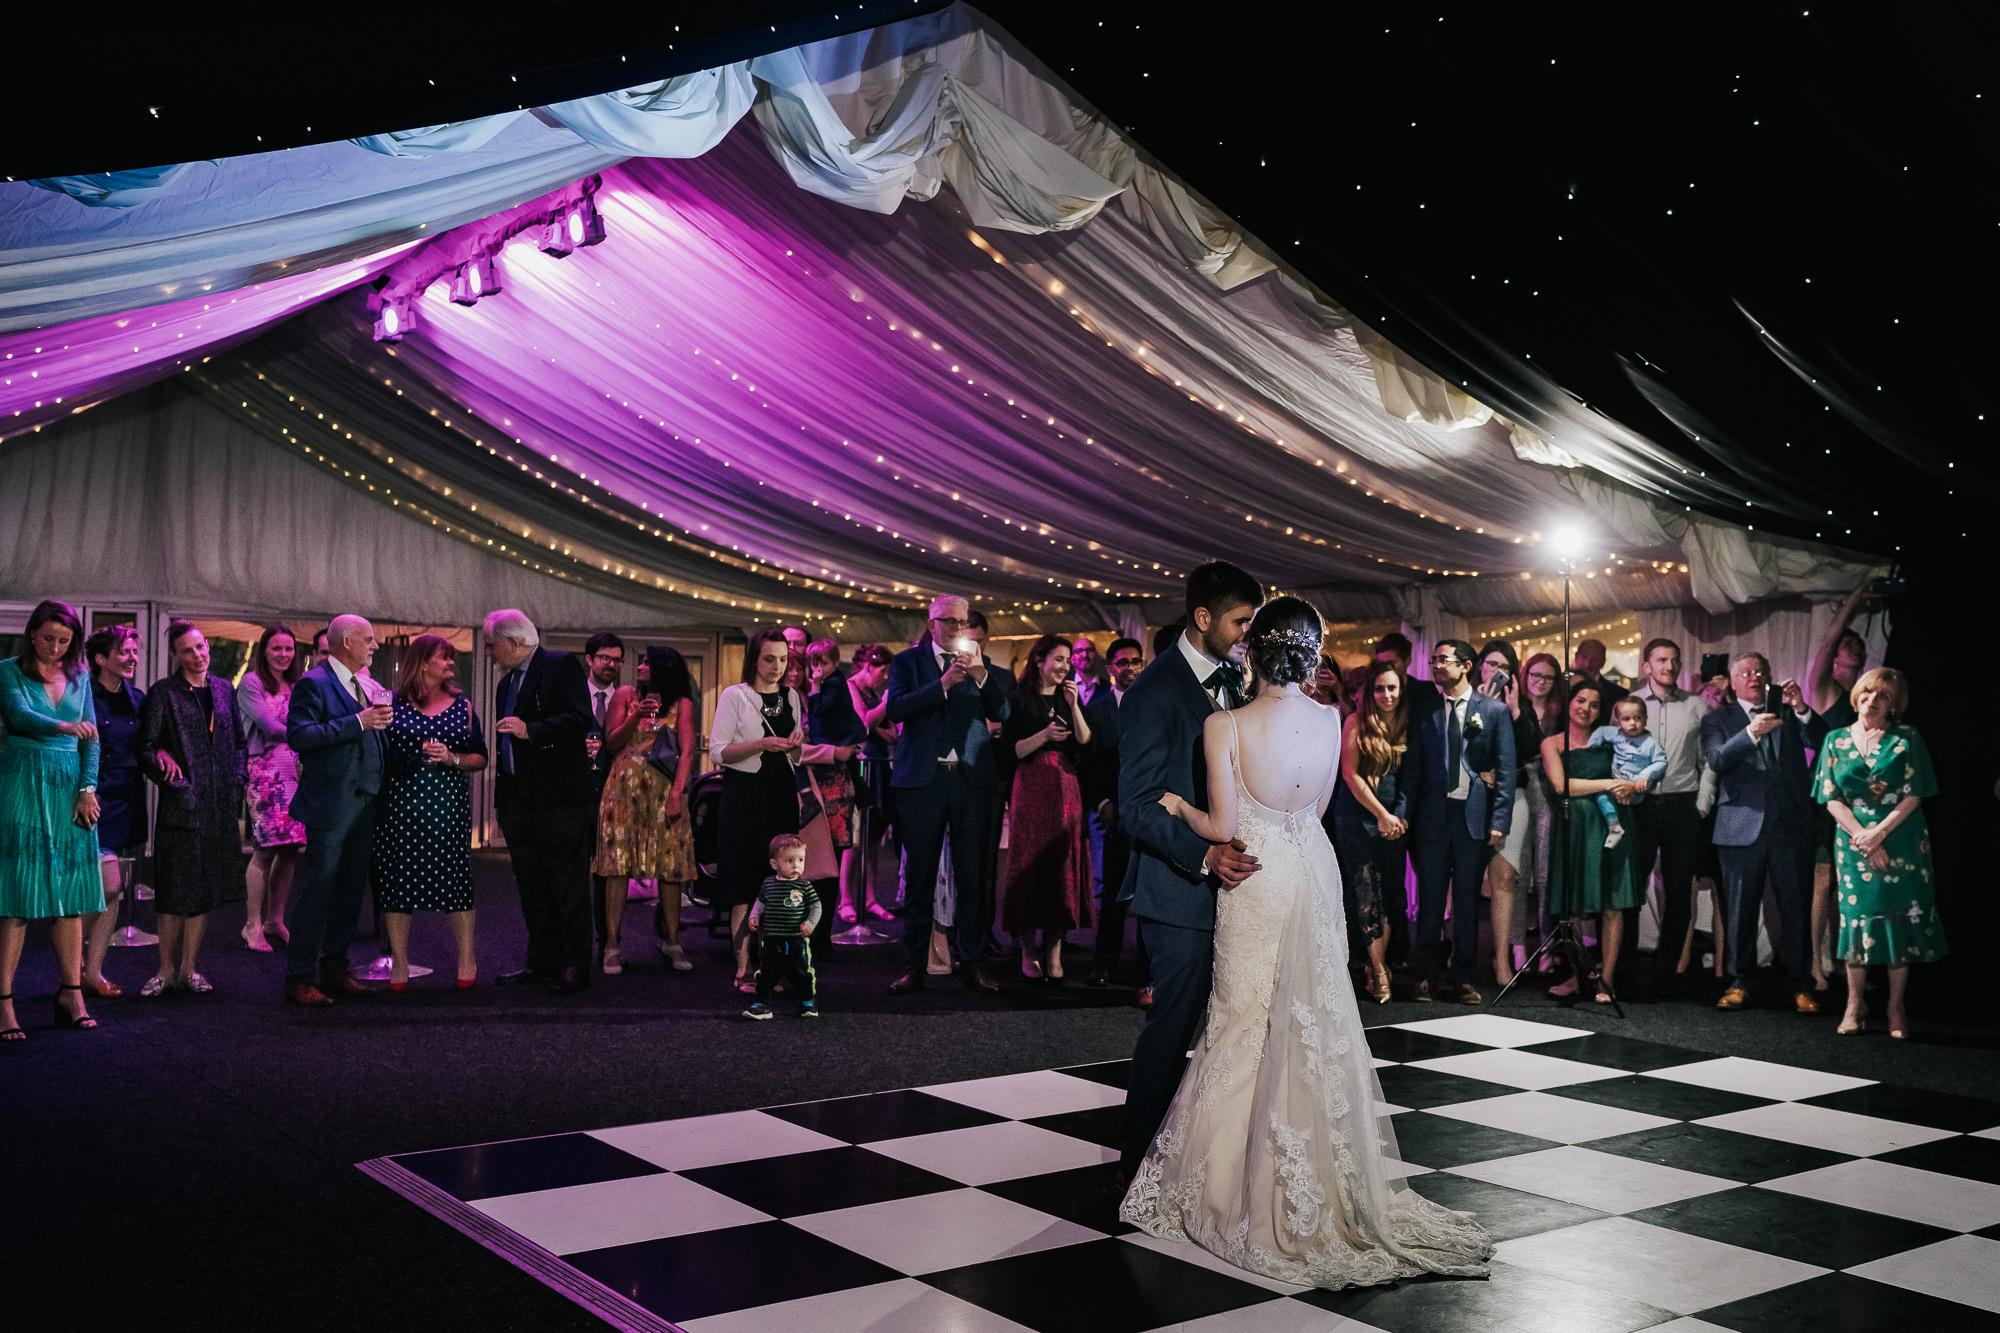 Nunsmere Hall Hotel Wedding photograhpy in cheshire wedding photographer (40 of 42).jpg